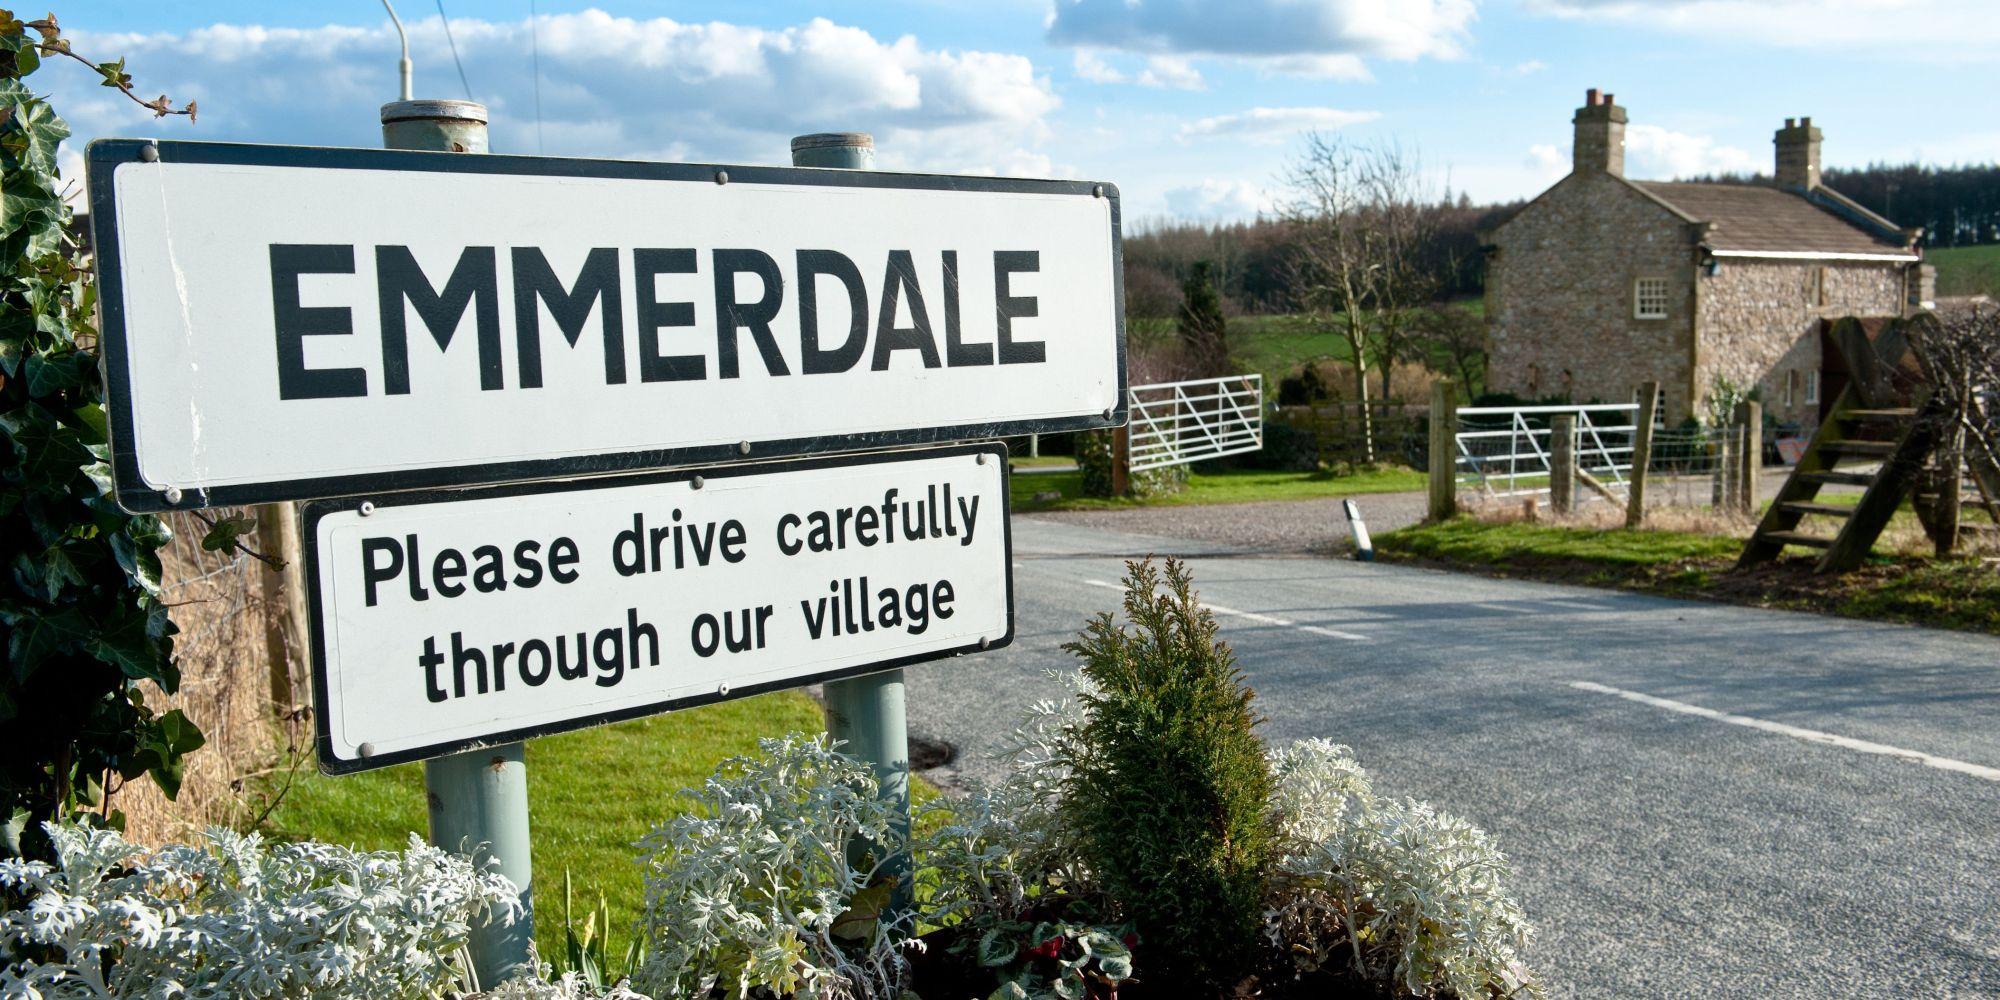 emmerdale - photo #10